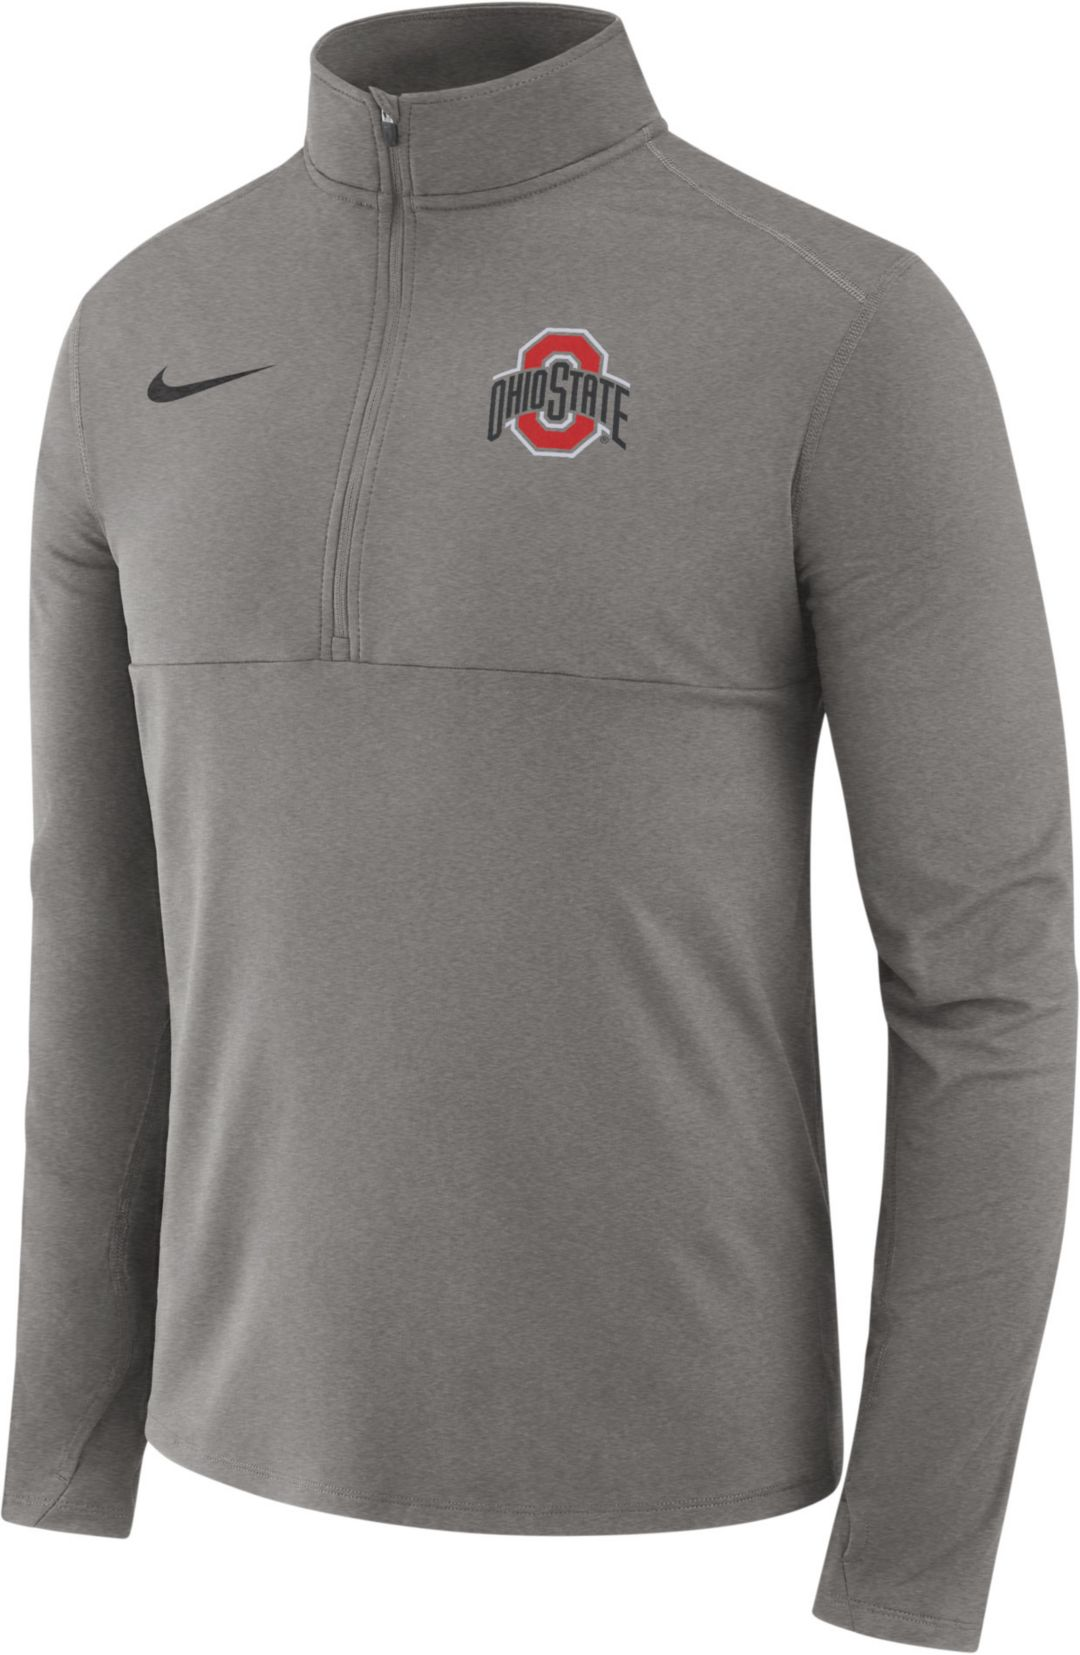 purchase cheap f0aa3 c5e20 Nike Men s Ohio State Buckeyes Gray Core Half-Zip Shirt   DICK S ...